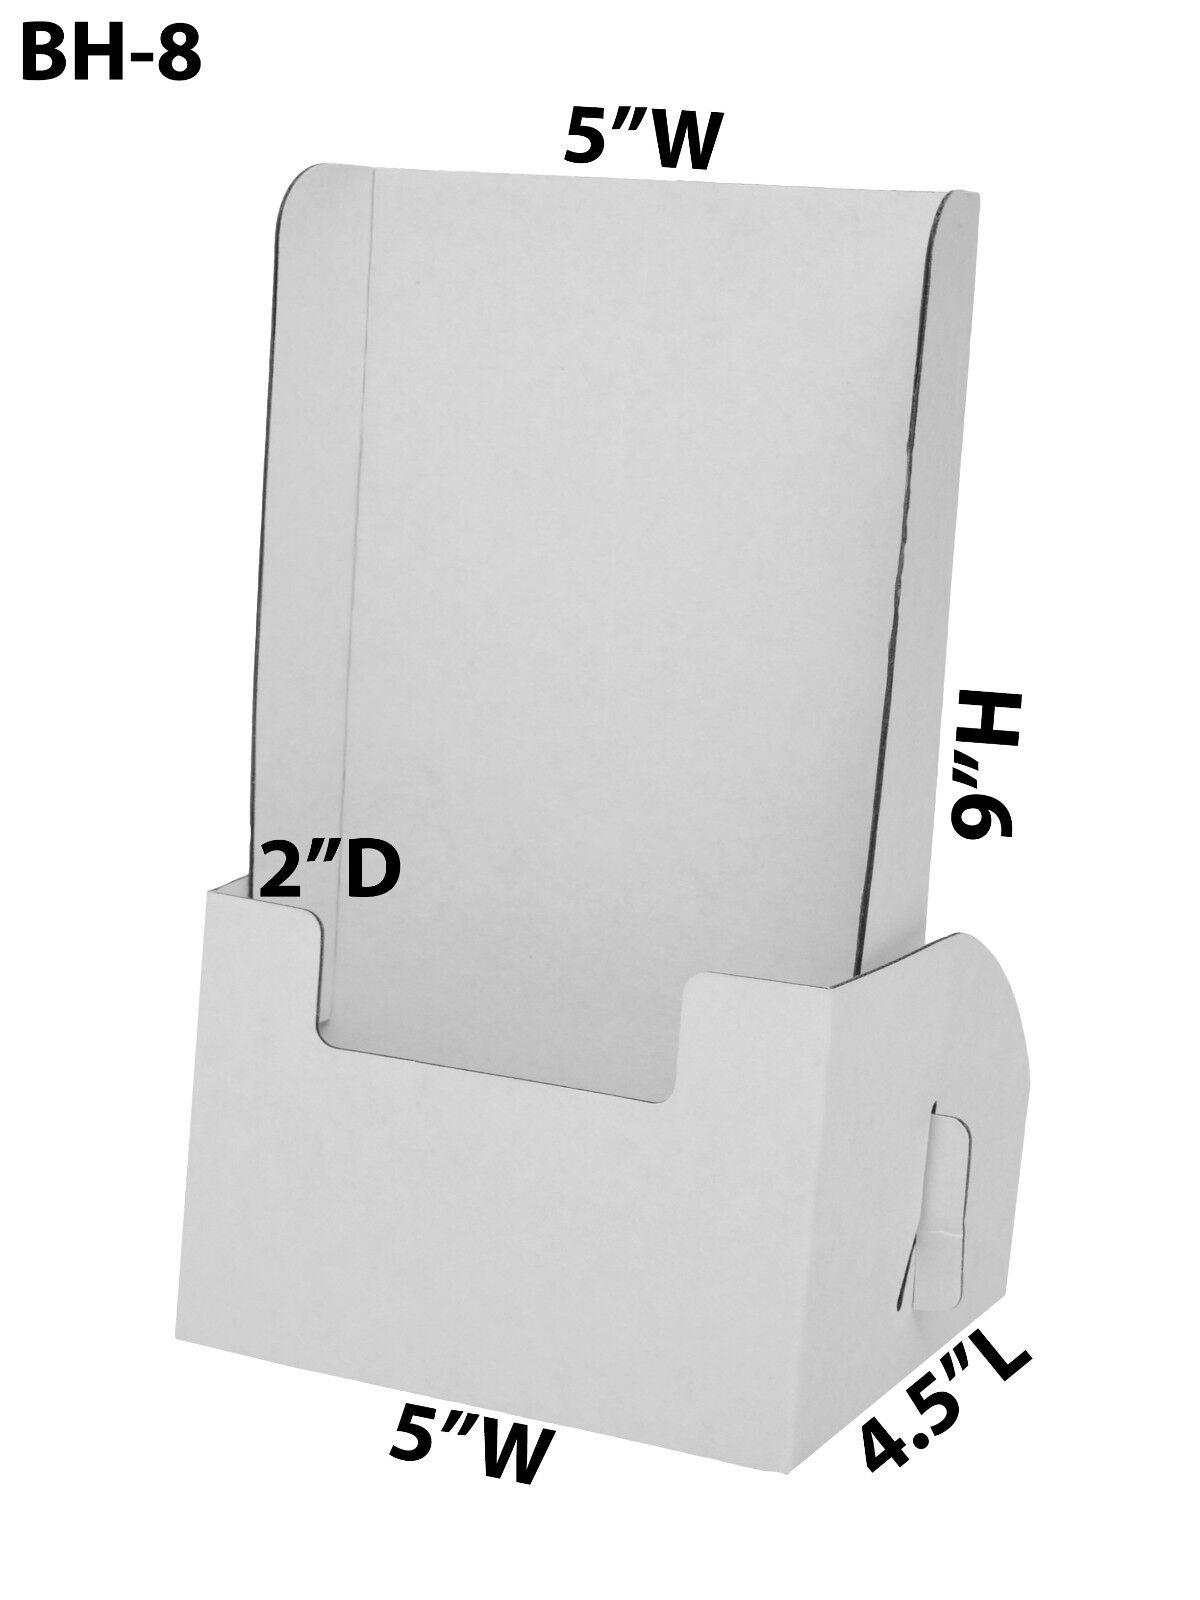 Lot of 50 Cardboard Brochure Holder 5  x 9  Leaflet Countertop Displays